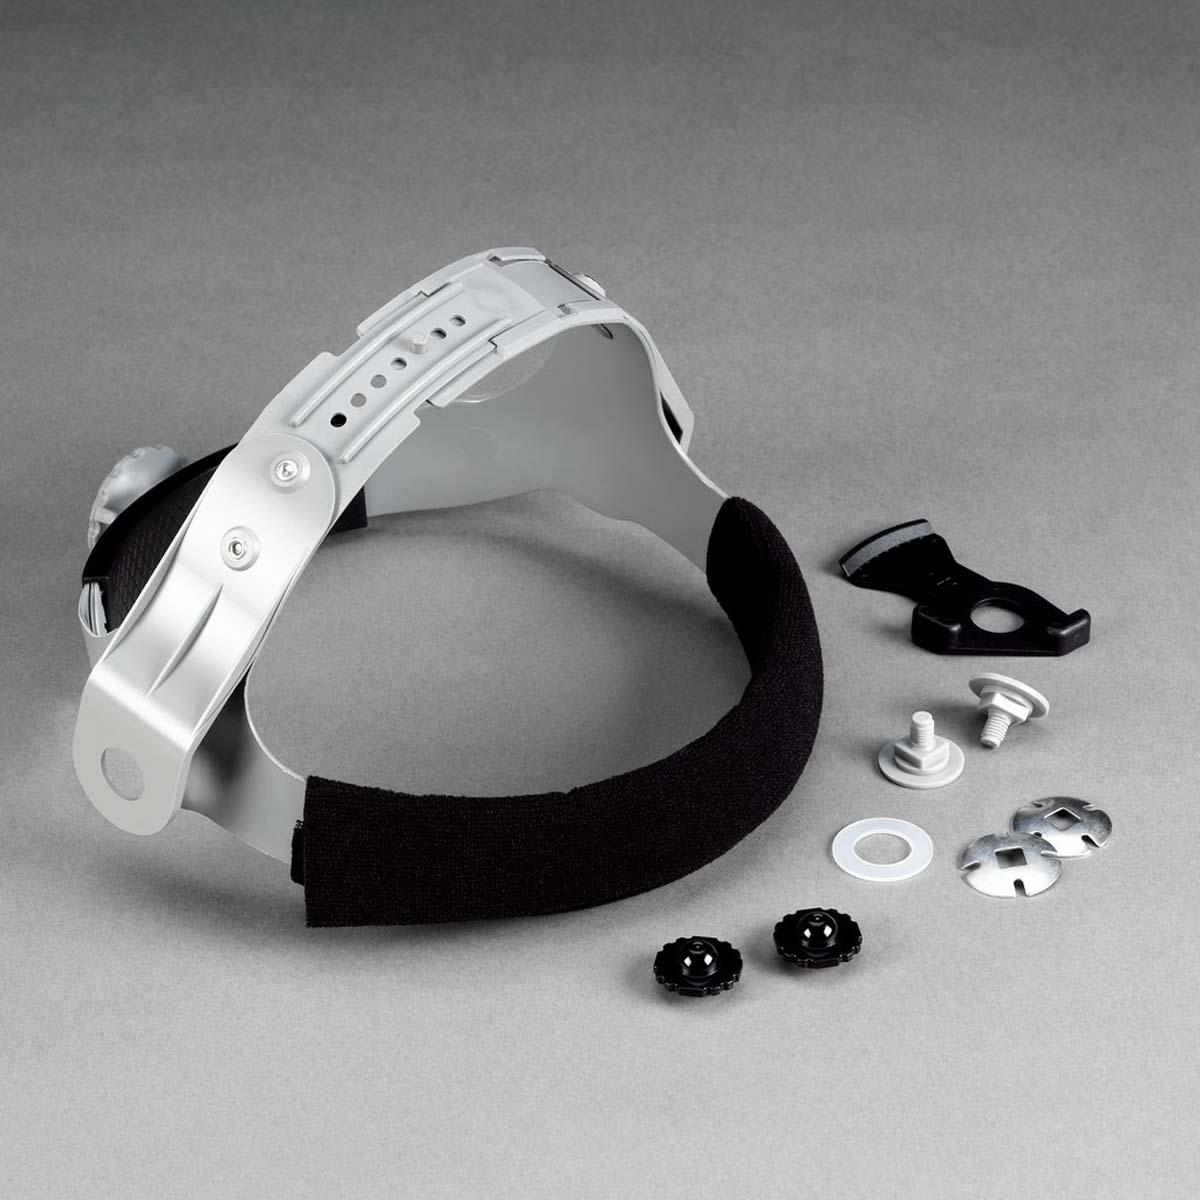 "3Mâ""¢ Speedglasâ""¢ Welding Helmet Headband and Mounting Hardware 04-0650-00/37140(AAD)"